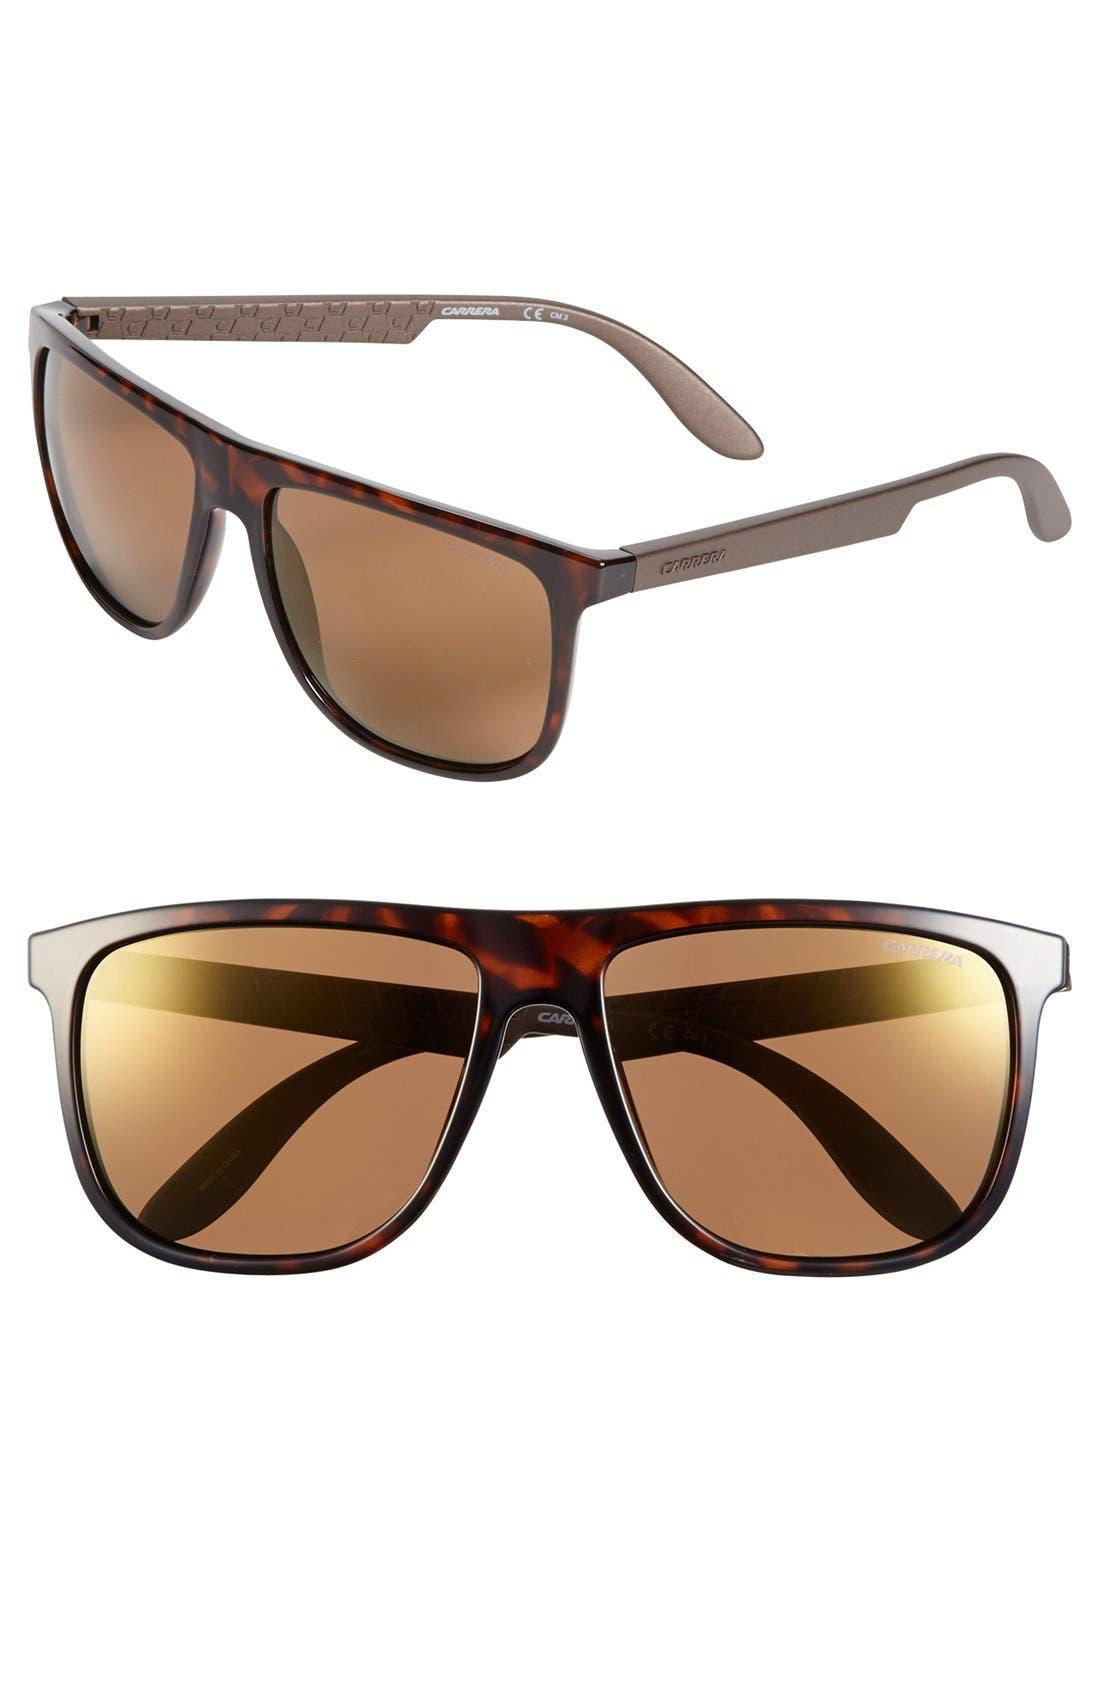 '5003' Sunglasses,                         Main,                         color, HAVANA